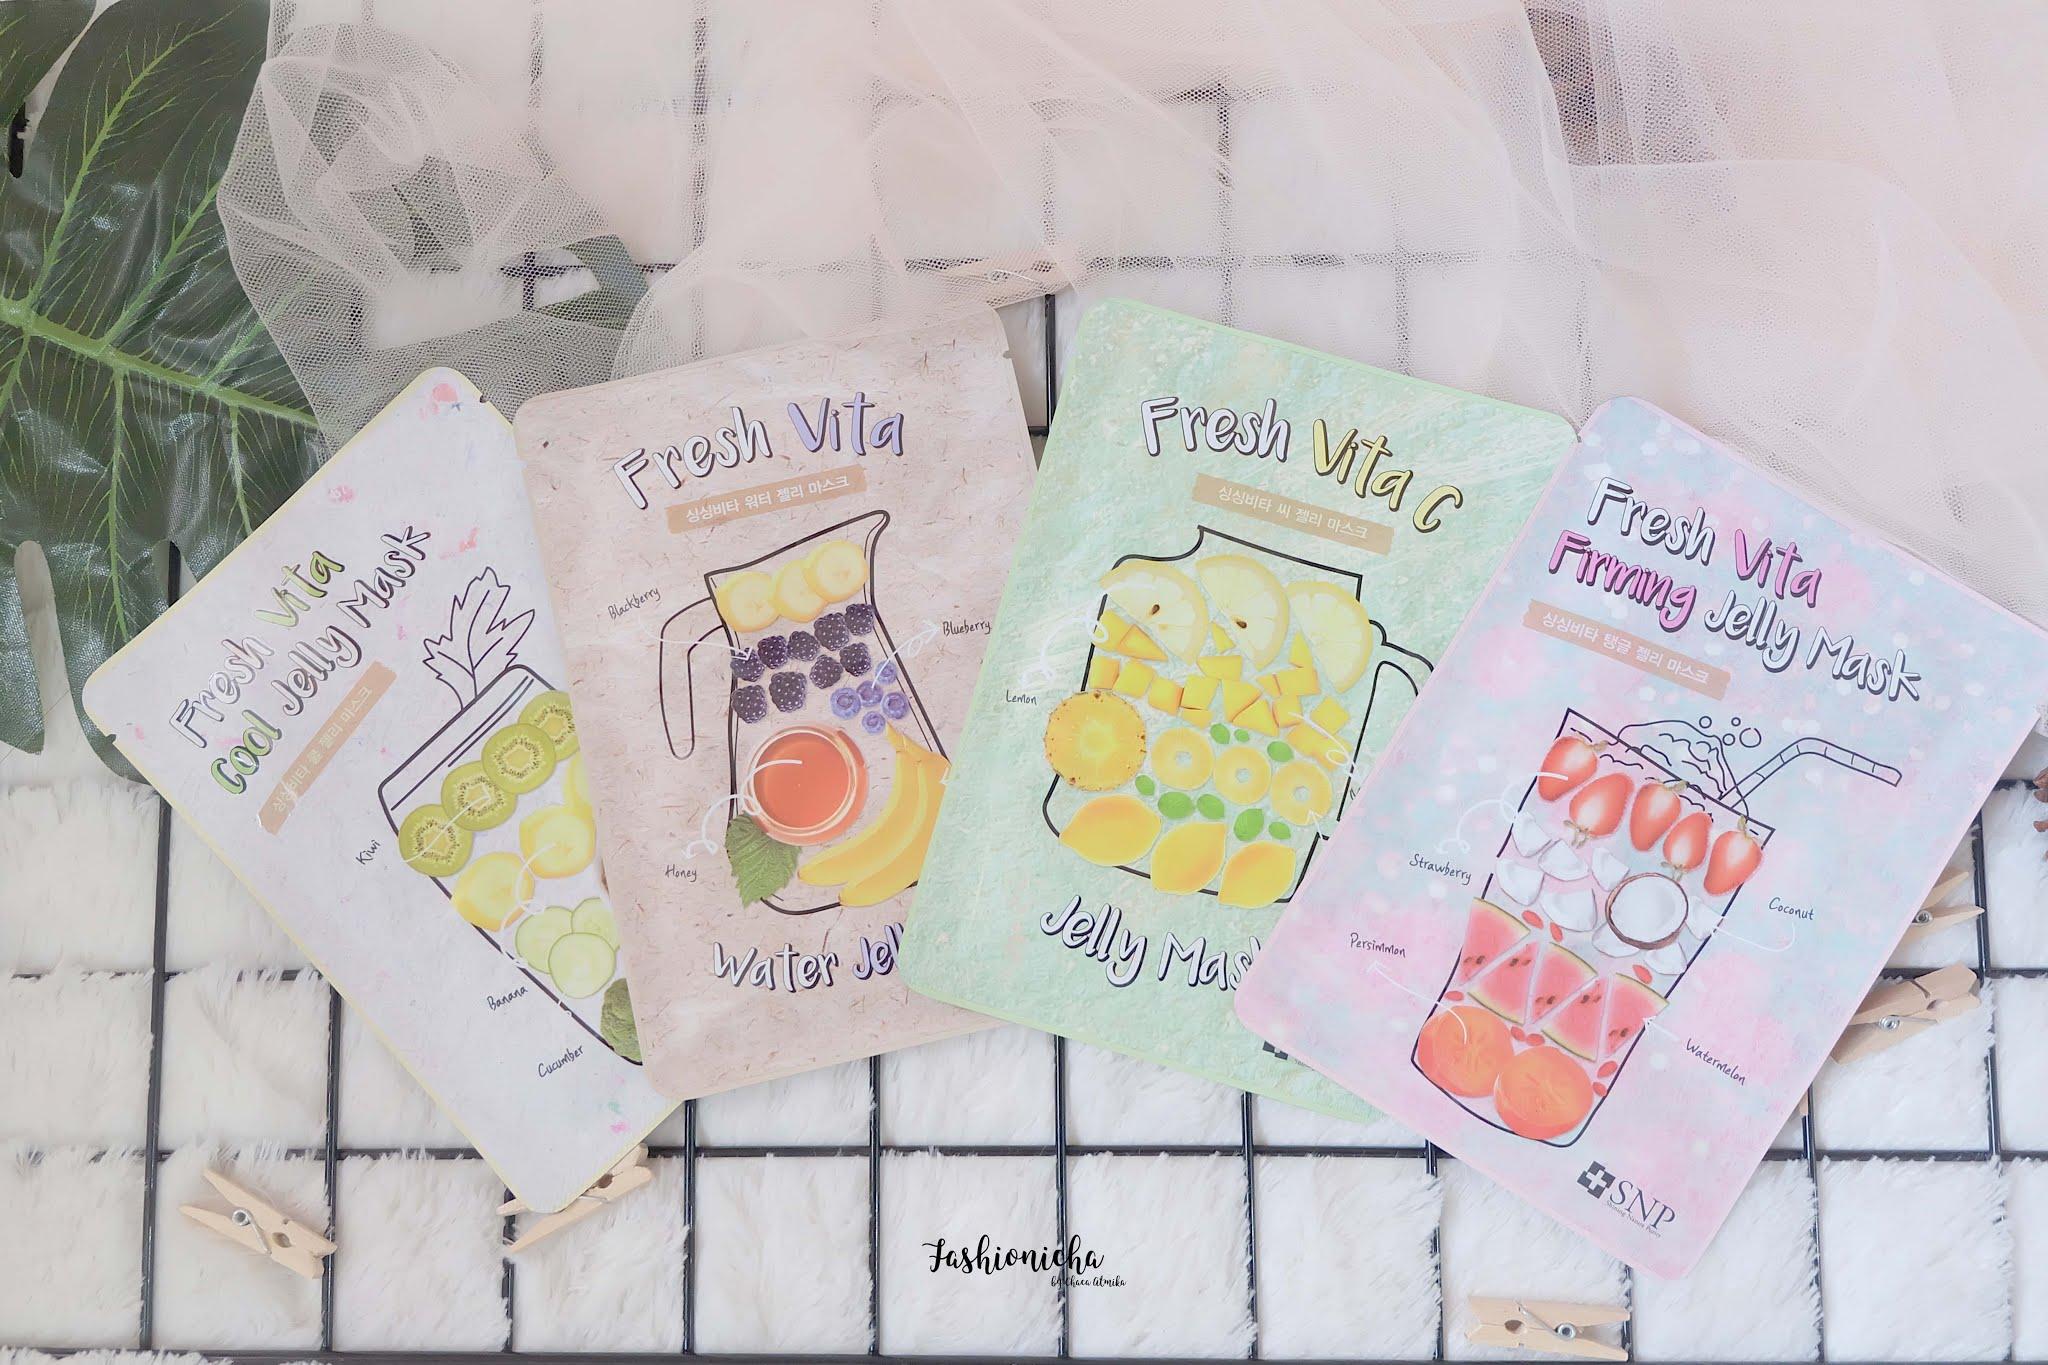 [Review] SNP Fresh Vita Jelly Mask